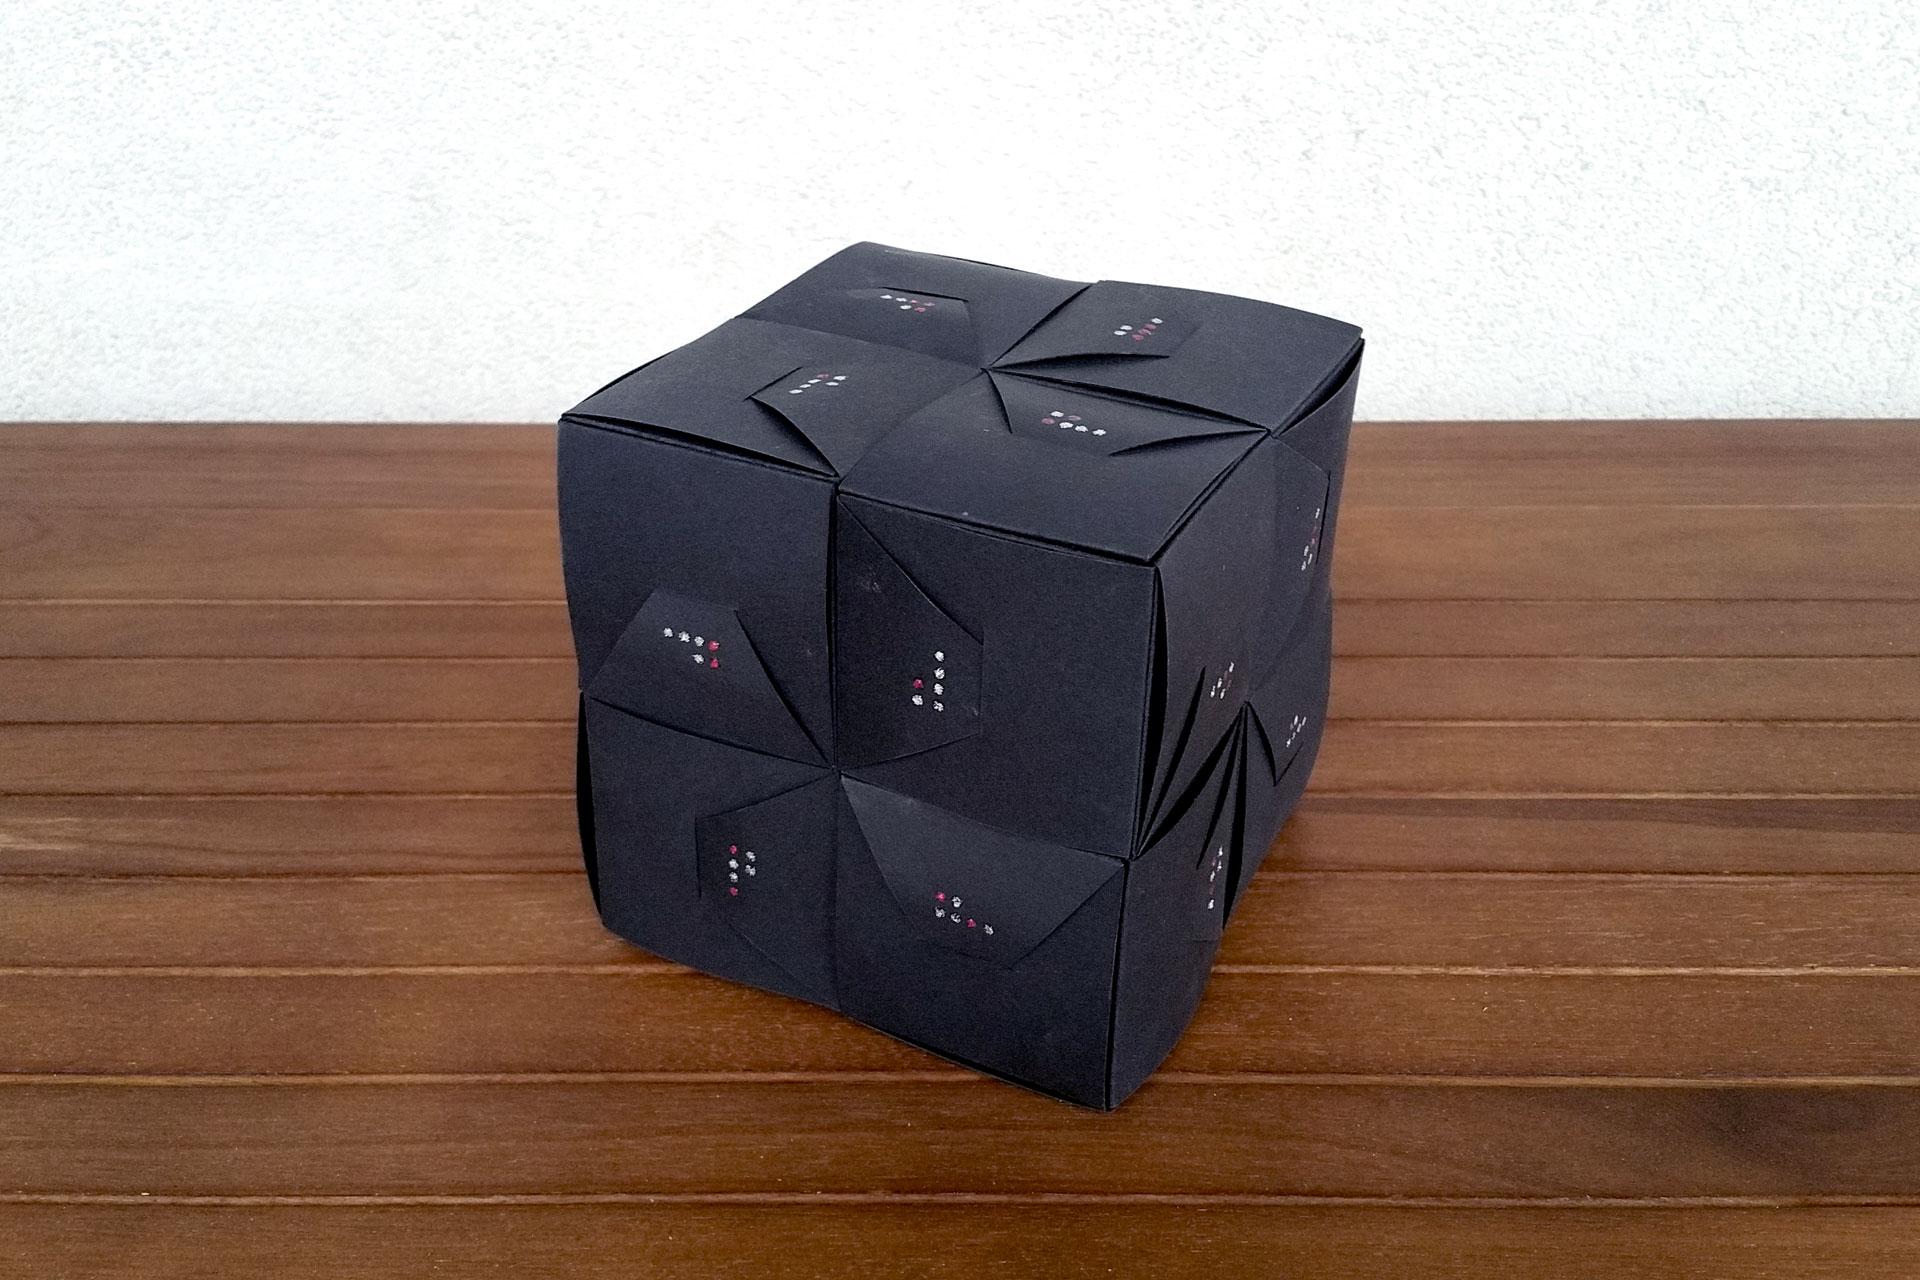 Binärer Christsmas Cube: DIY Adventskalender für faule Nerds